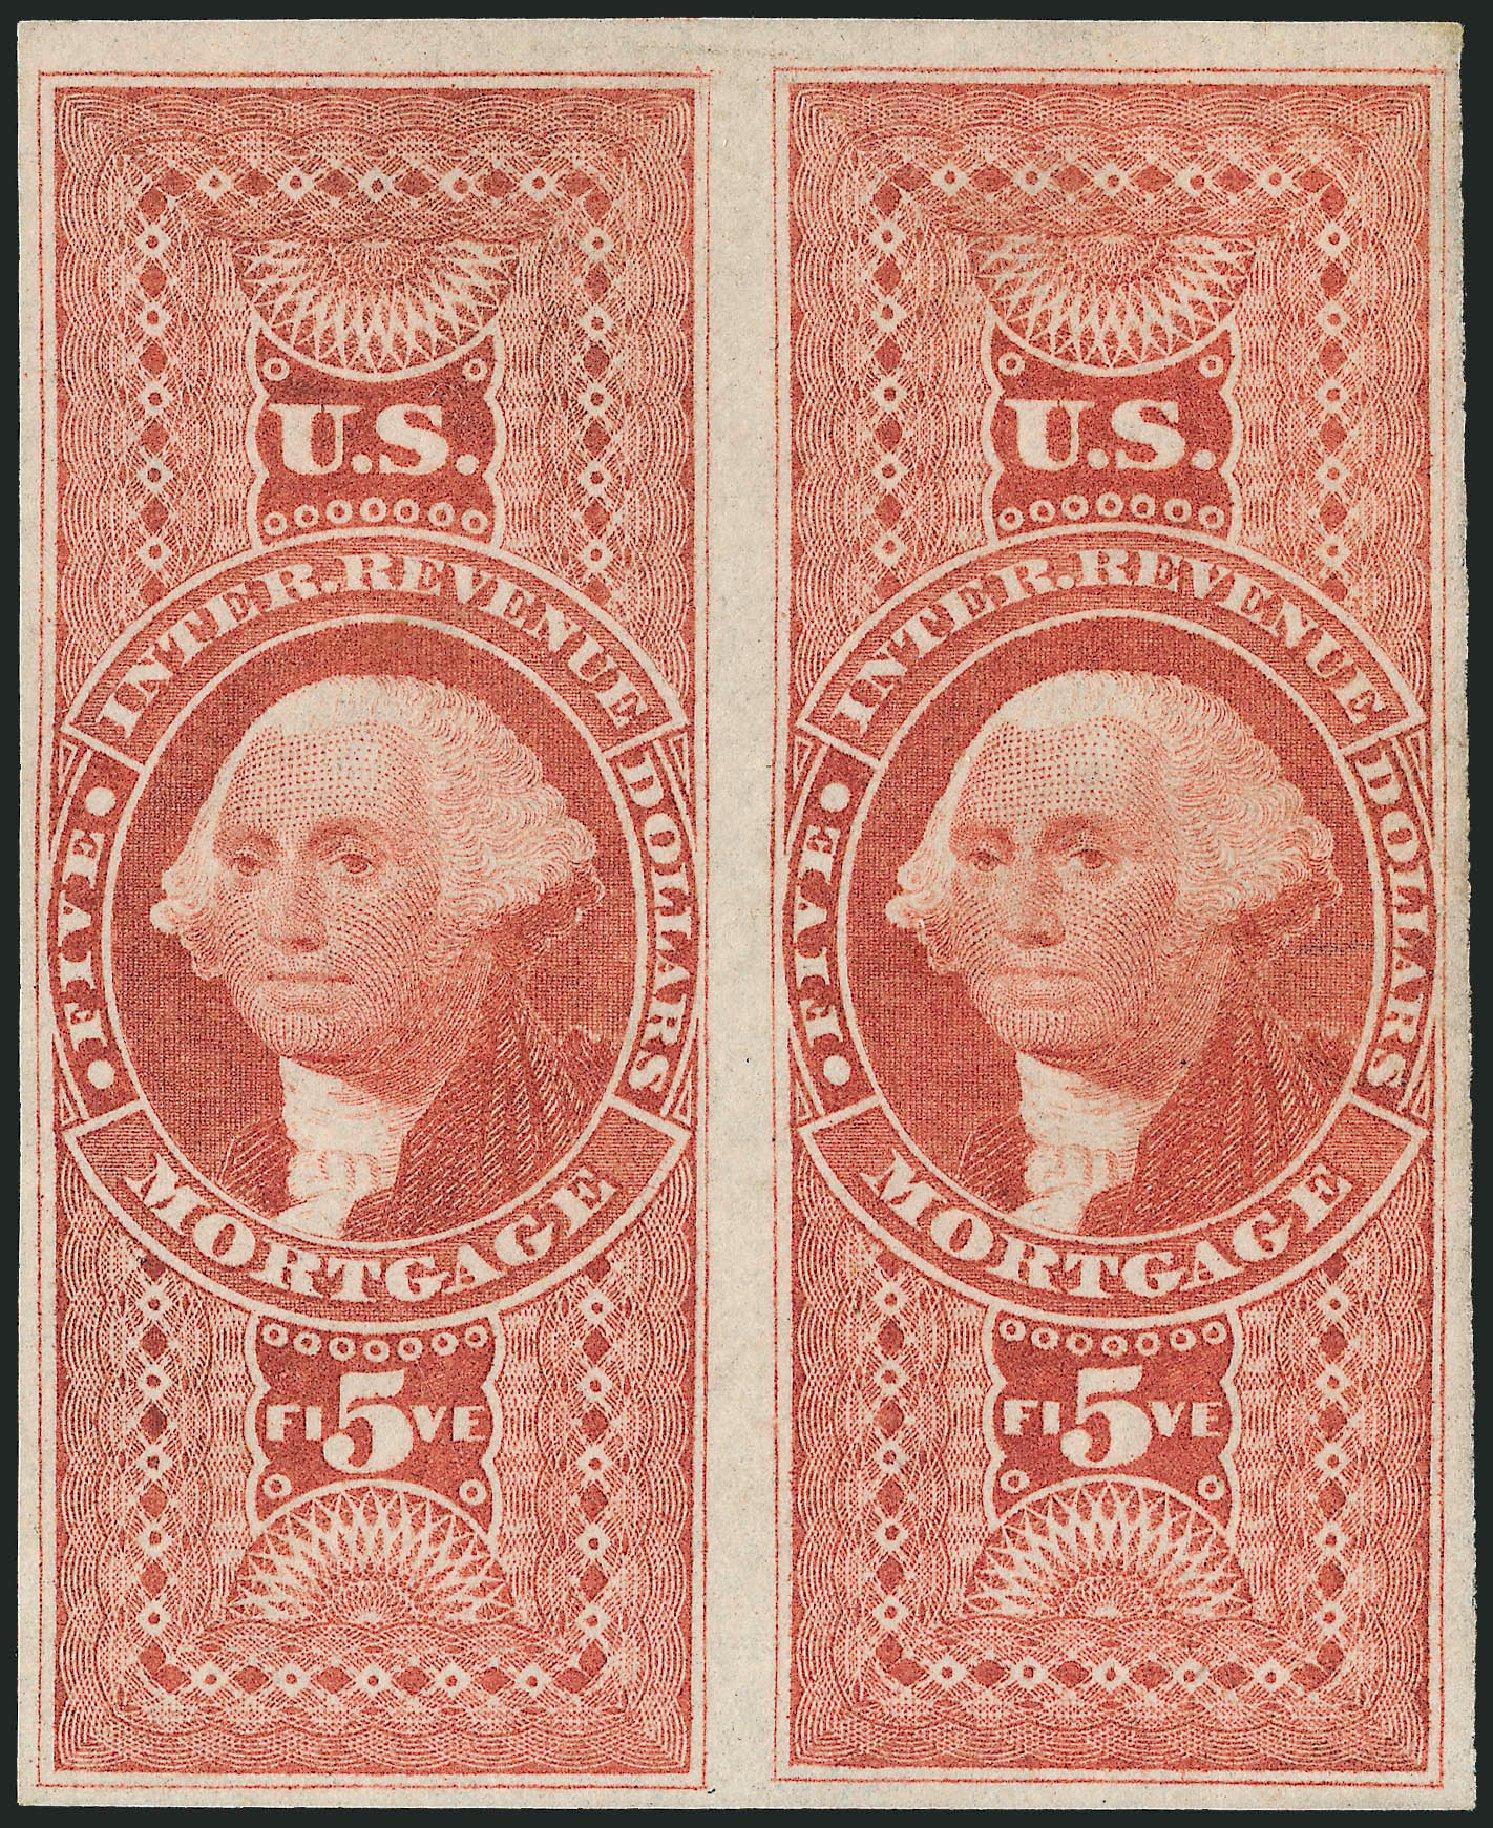 Costs of US Stamps Scott Catalog # R91 - 1862 US$5.00 Revenue Mortgage. Robert Siegel Auction Galleries, Dec 2008, Sale 967, Lot 5241